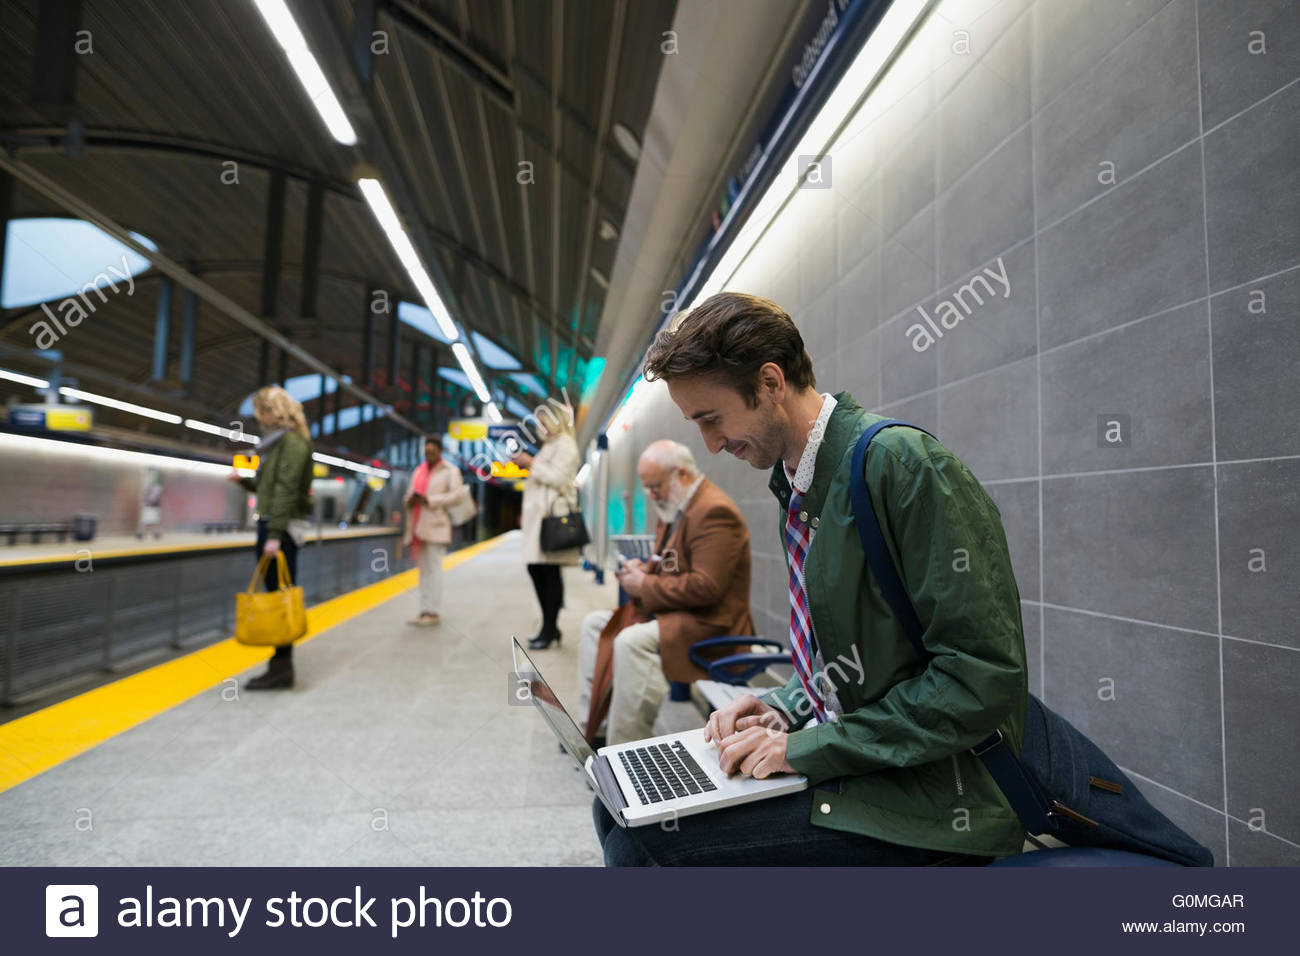 Businessman using laptop on bench subway station platform - Stock Image